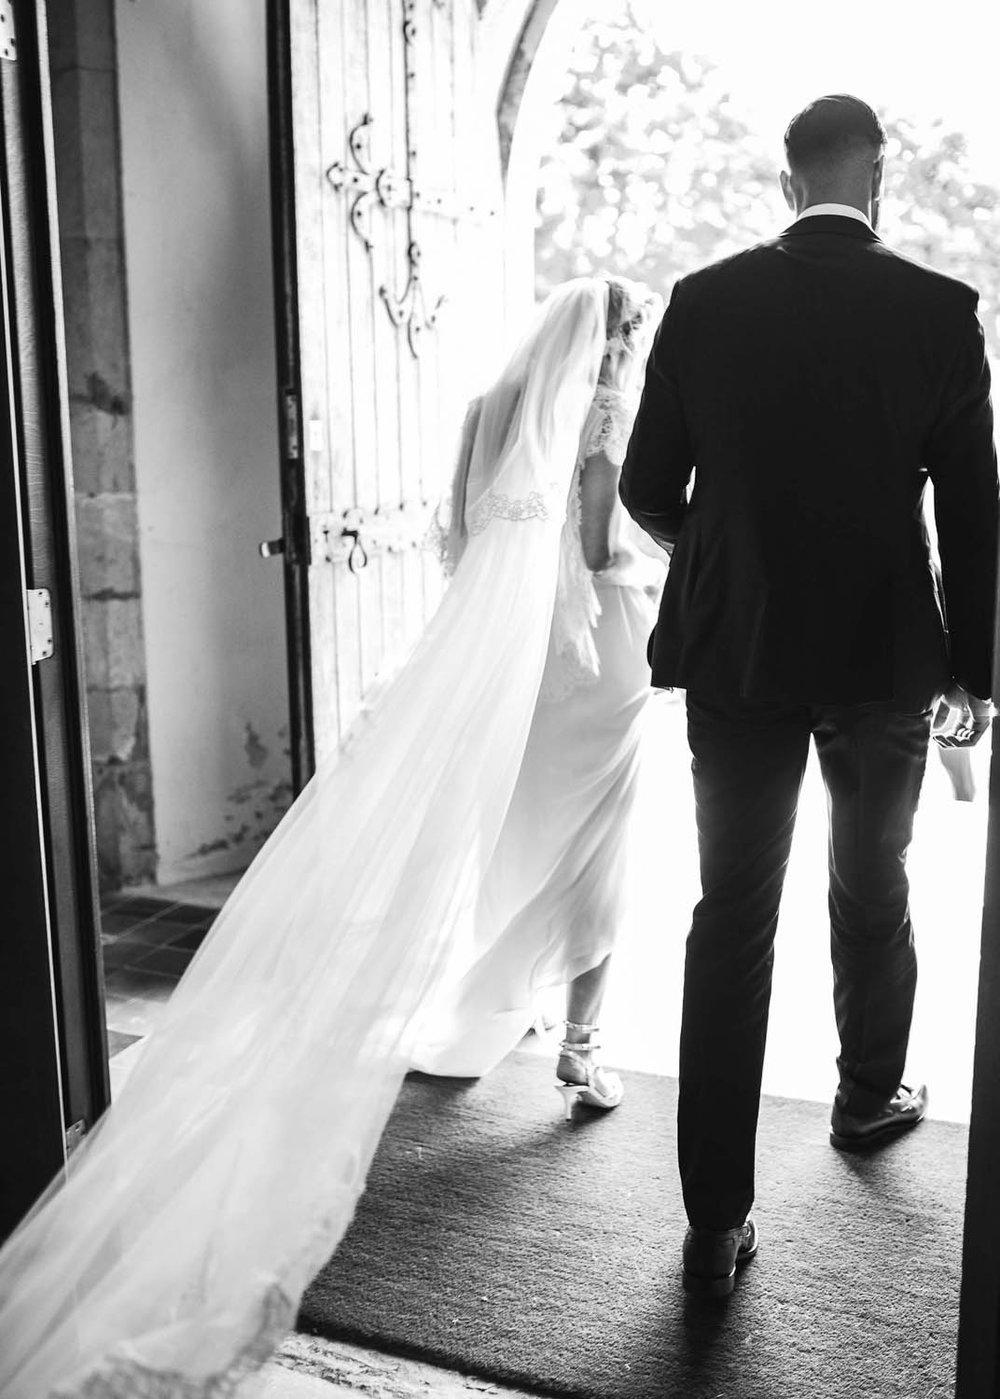 Amy O'Boyle Photography, Destination & UK Fine Art Film Wedding Photographer, Hastings Wedding-7.jpg